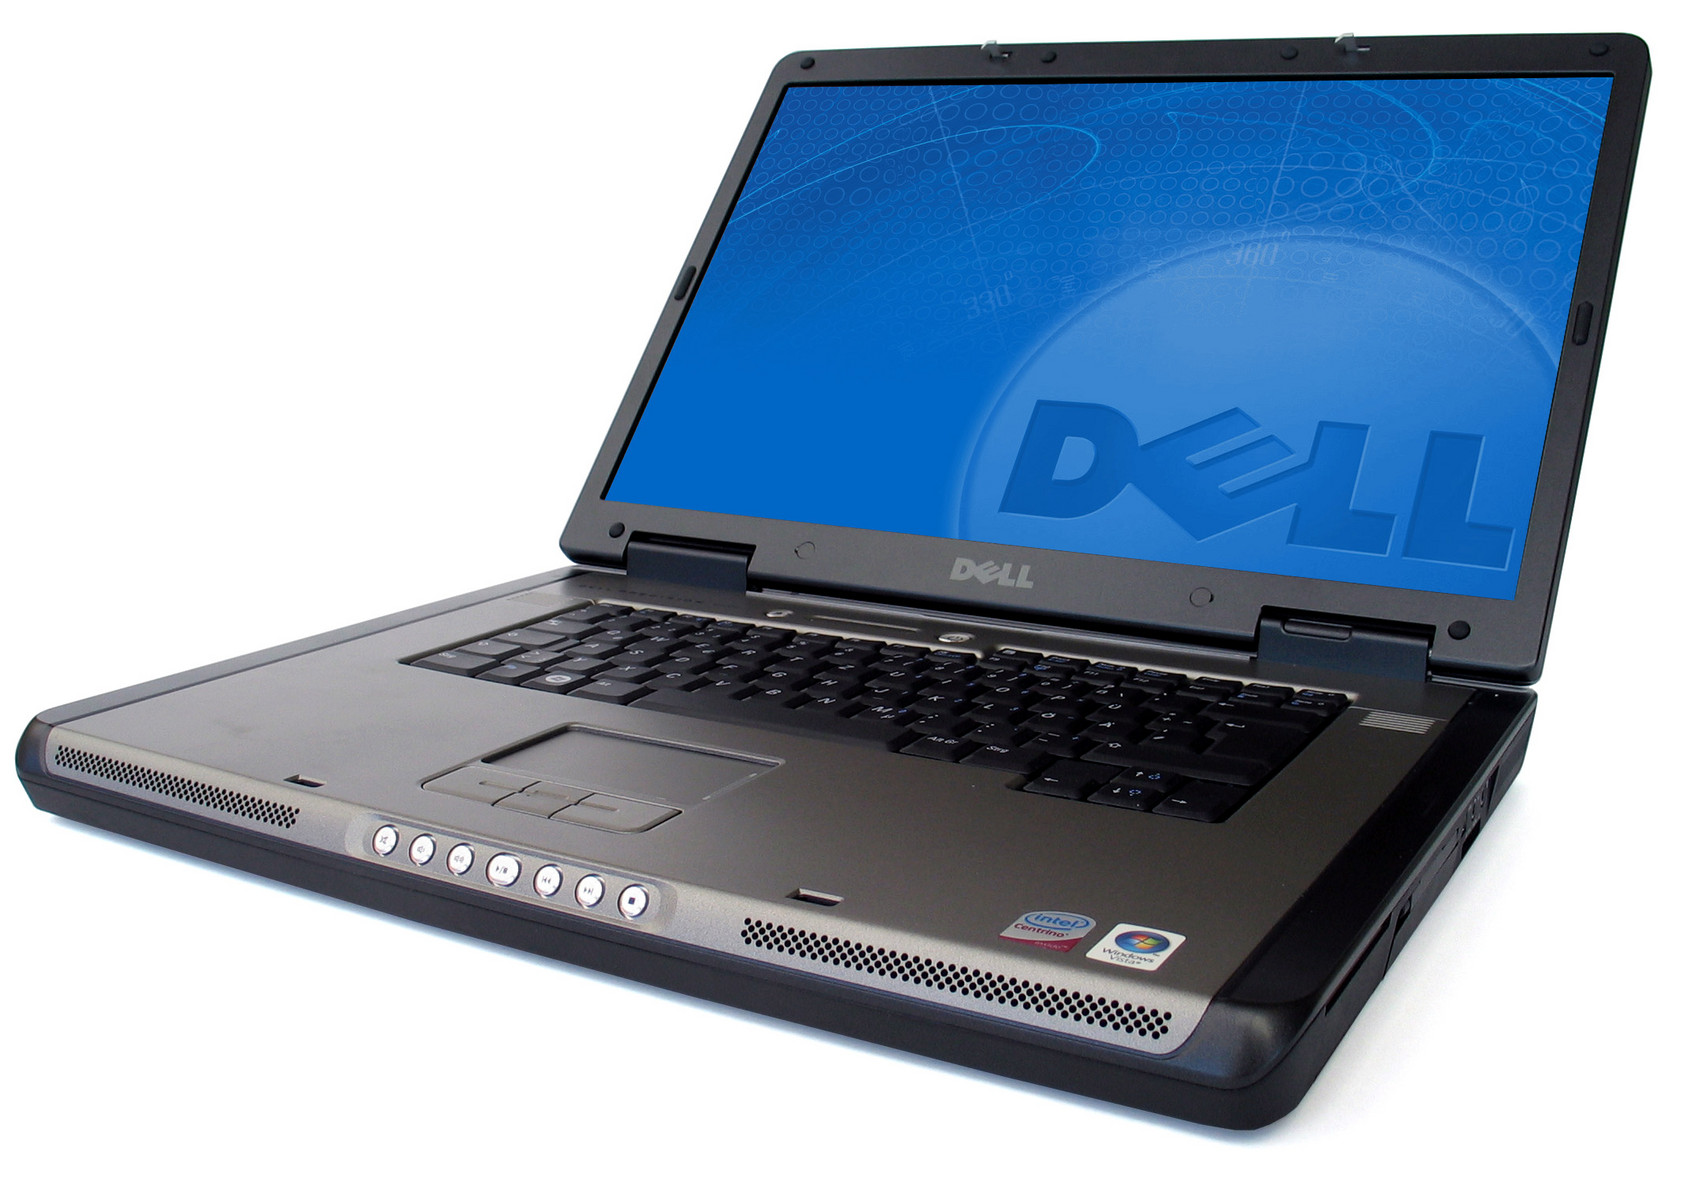 Dell XPS 200 SIGMATEL Audio Windows 7